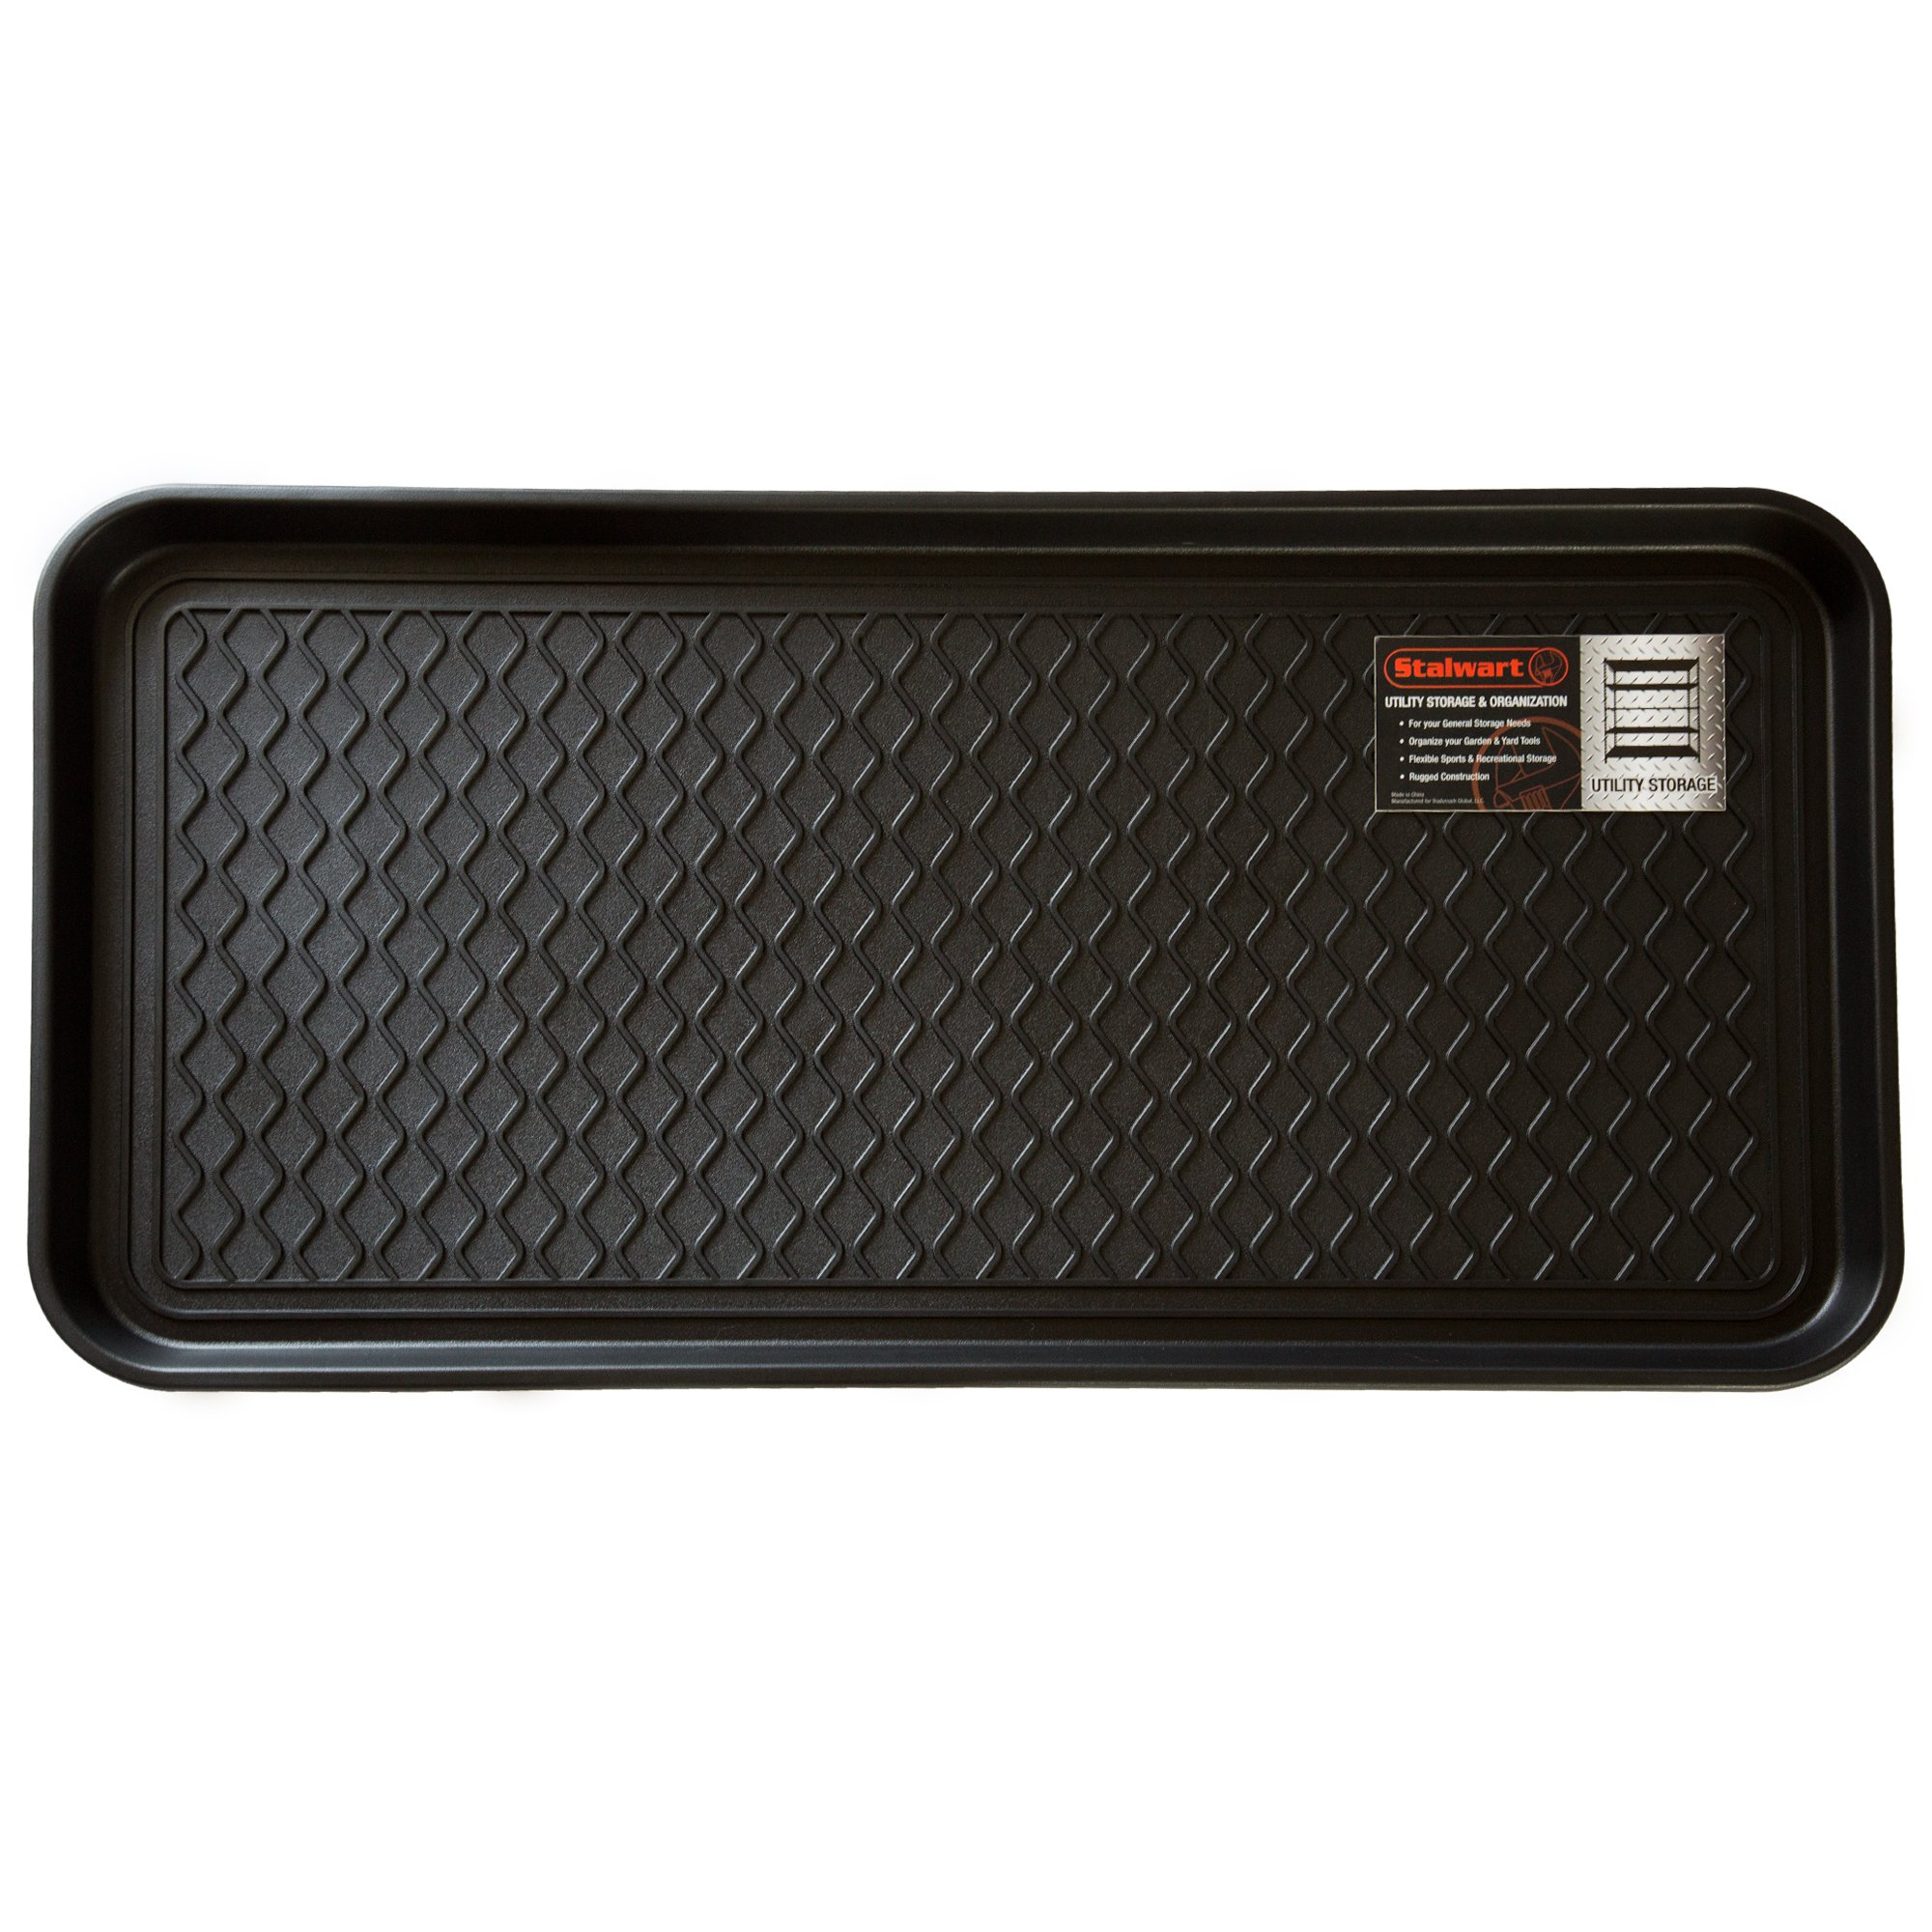 diy cheaper black cat litter hole this can trap mat than mats pin the